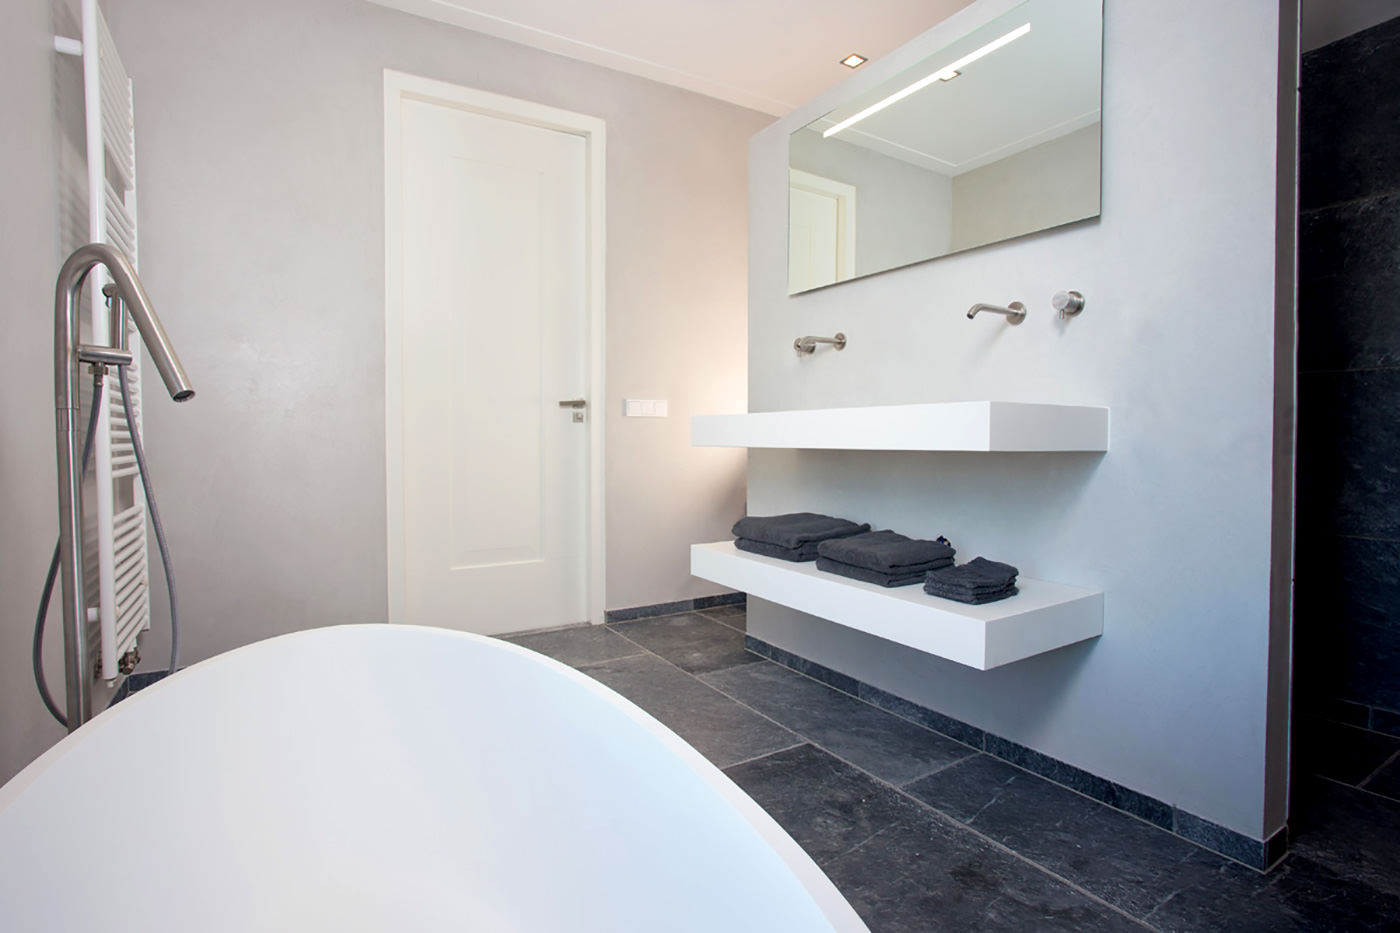 cocoon-welness-bathroom-spa-bathroom-welness-design-welness-pictures-bathroom-design-badkamerdesign-Amsterdam-witte-badkamer-white-bathroom